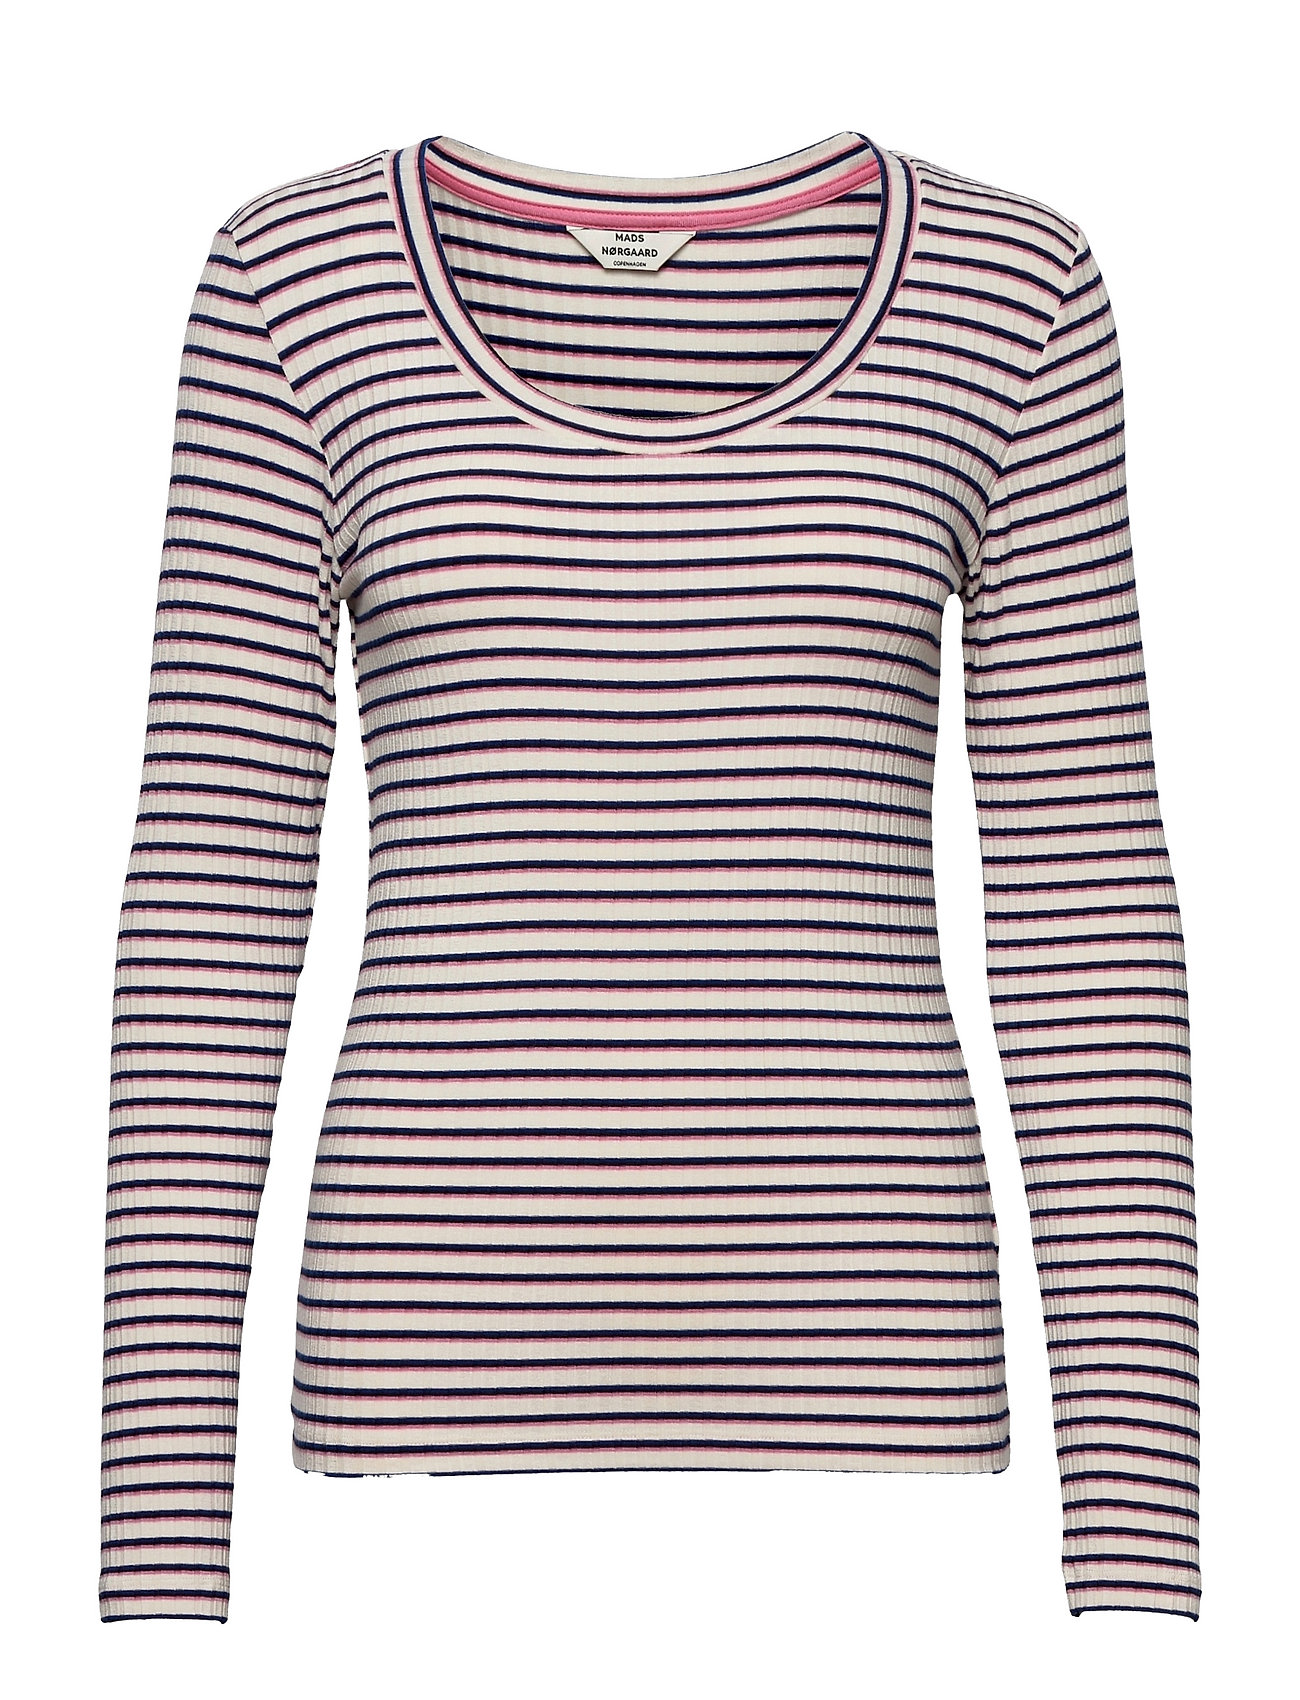 5x5 Stripe Tinilla Langærmet T-shirt Multi/mønstret Mads Nørgaard